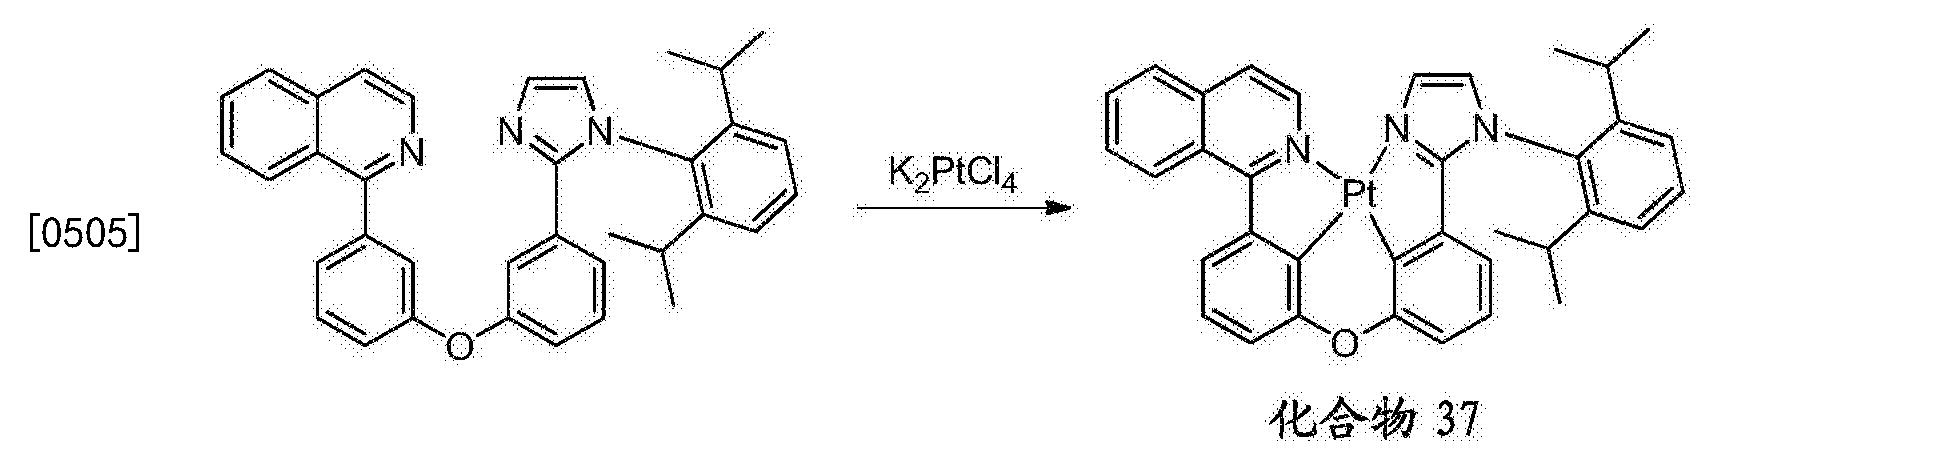 Figure CN106749425AD01523